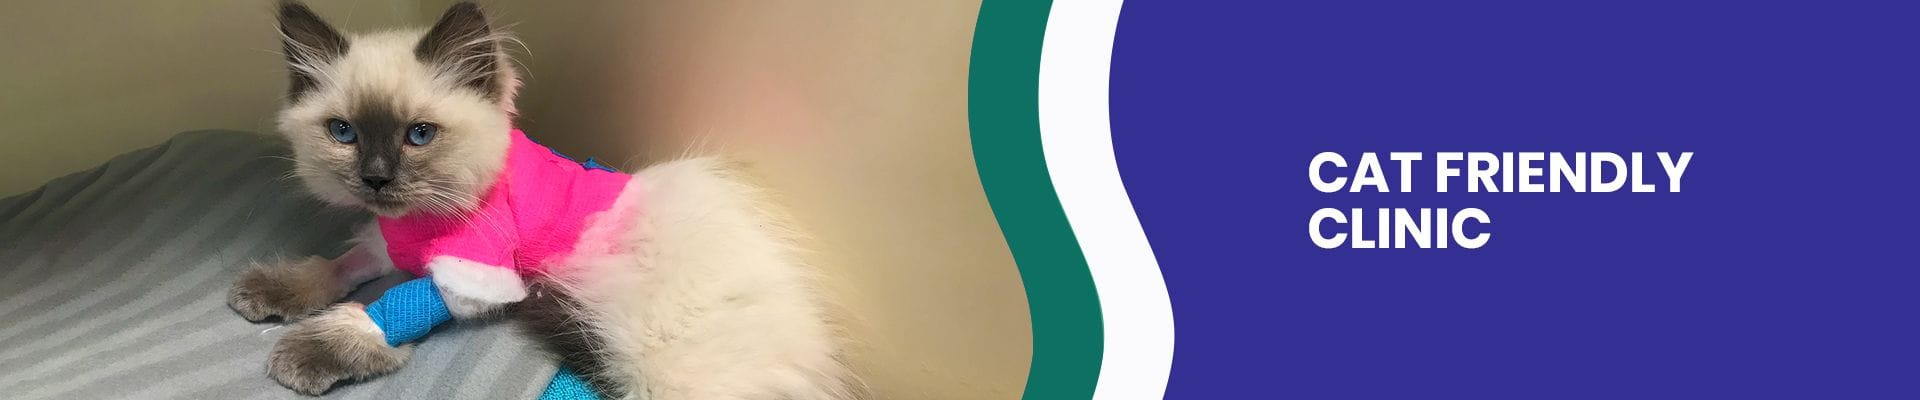 Cat Friendly Clinic in Underwood | Cat Vet Brisbane